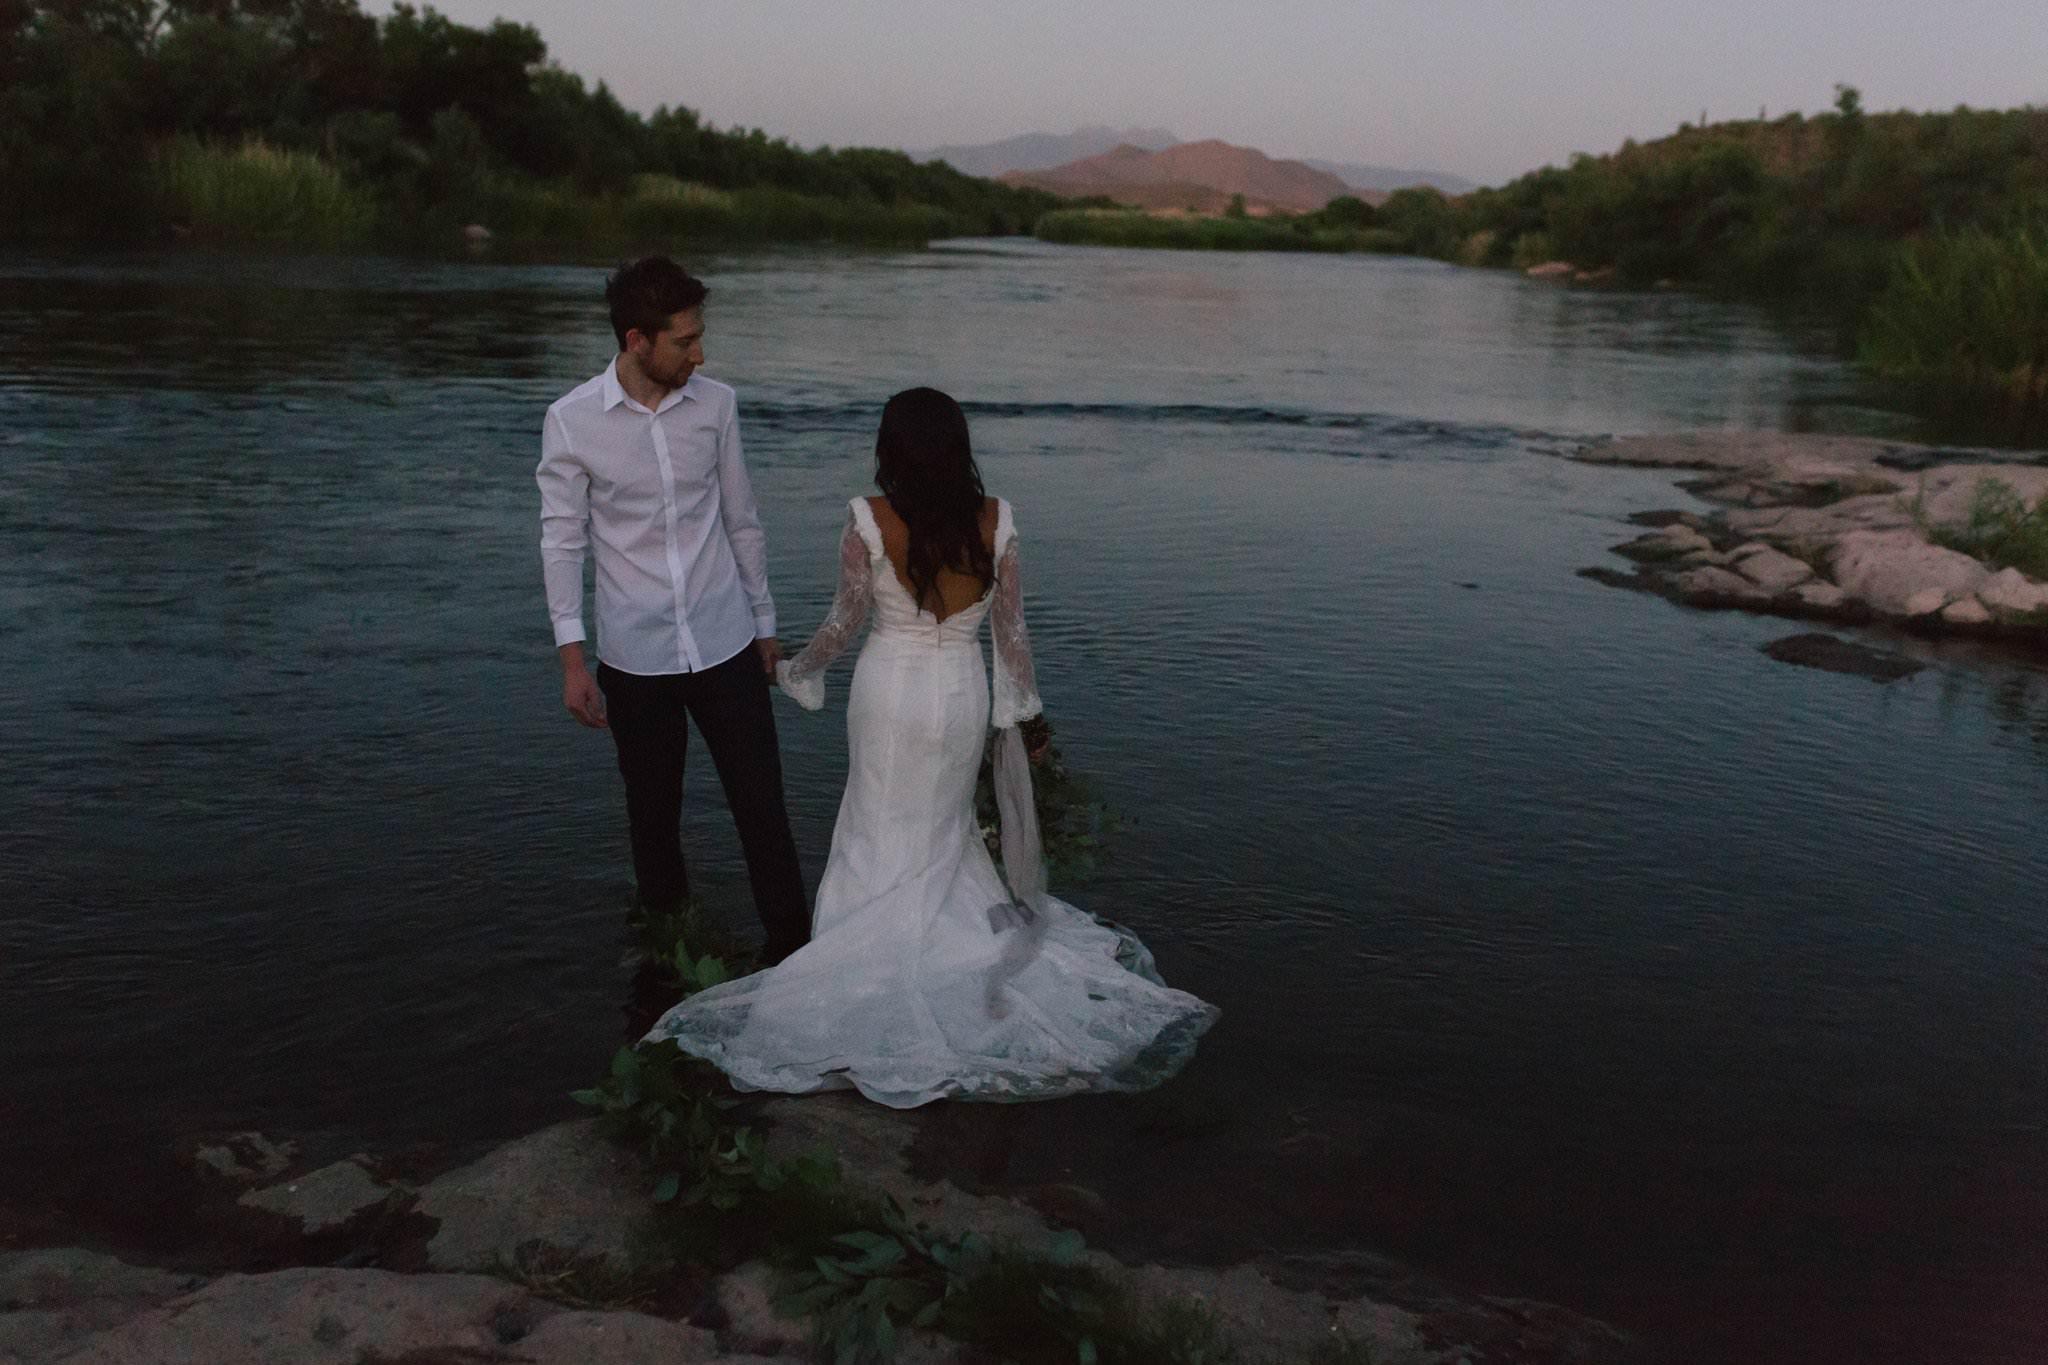 Salt River trash the wedding dress photos